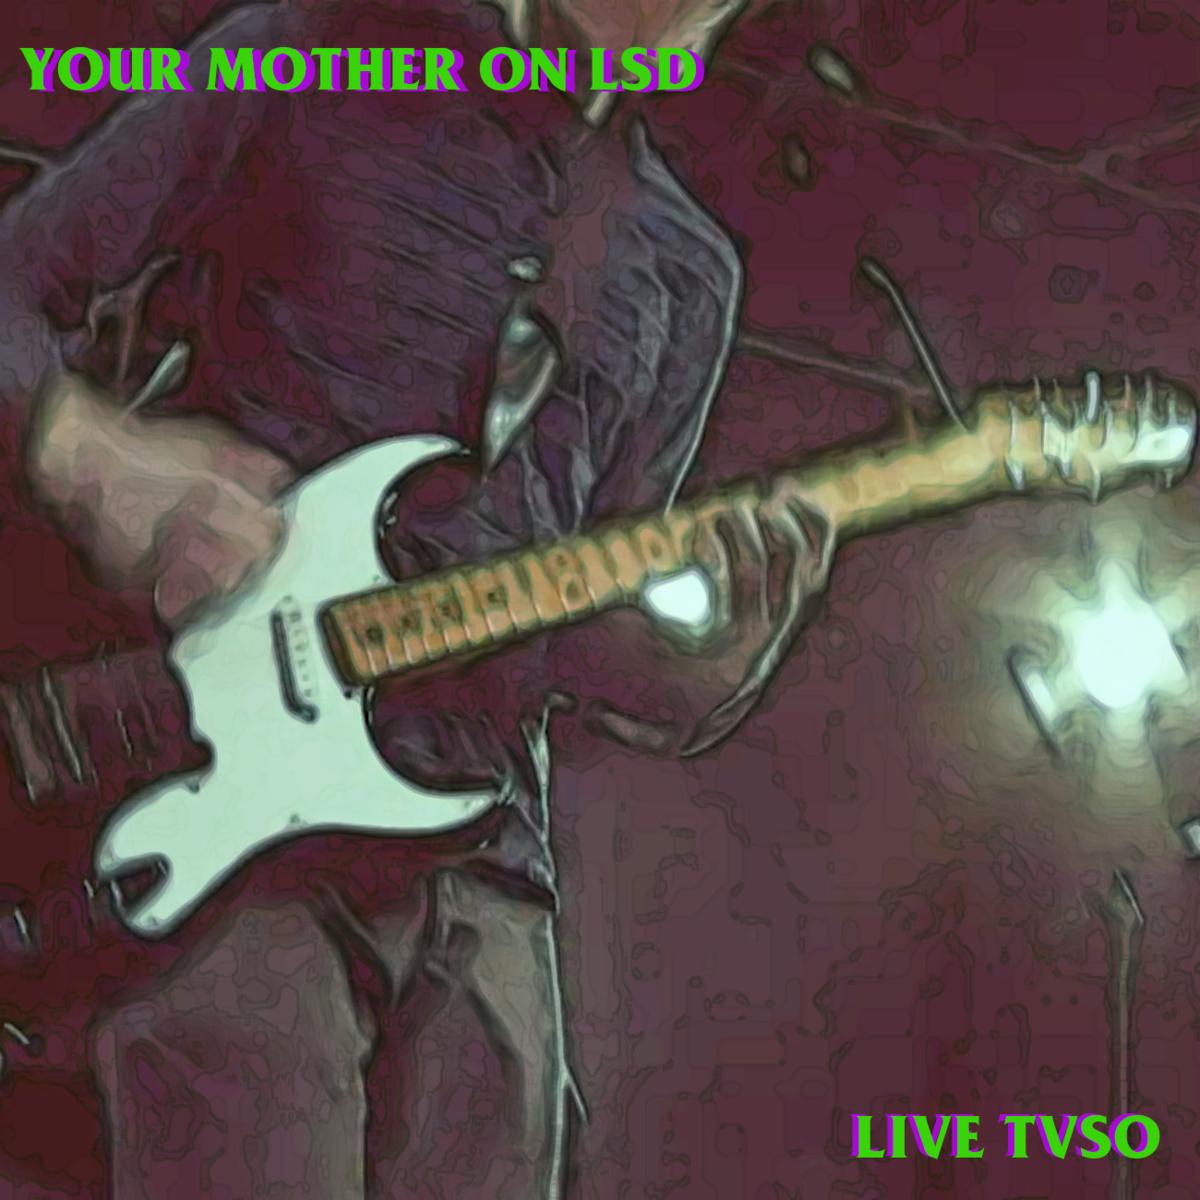 your_mother_on_lsd_live_tvso.jpg